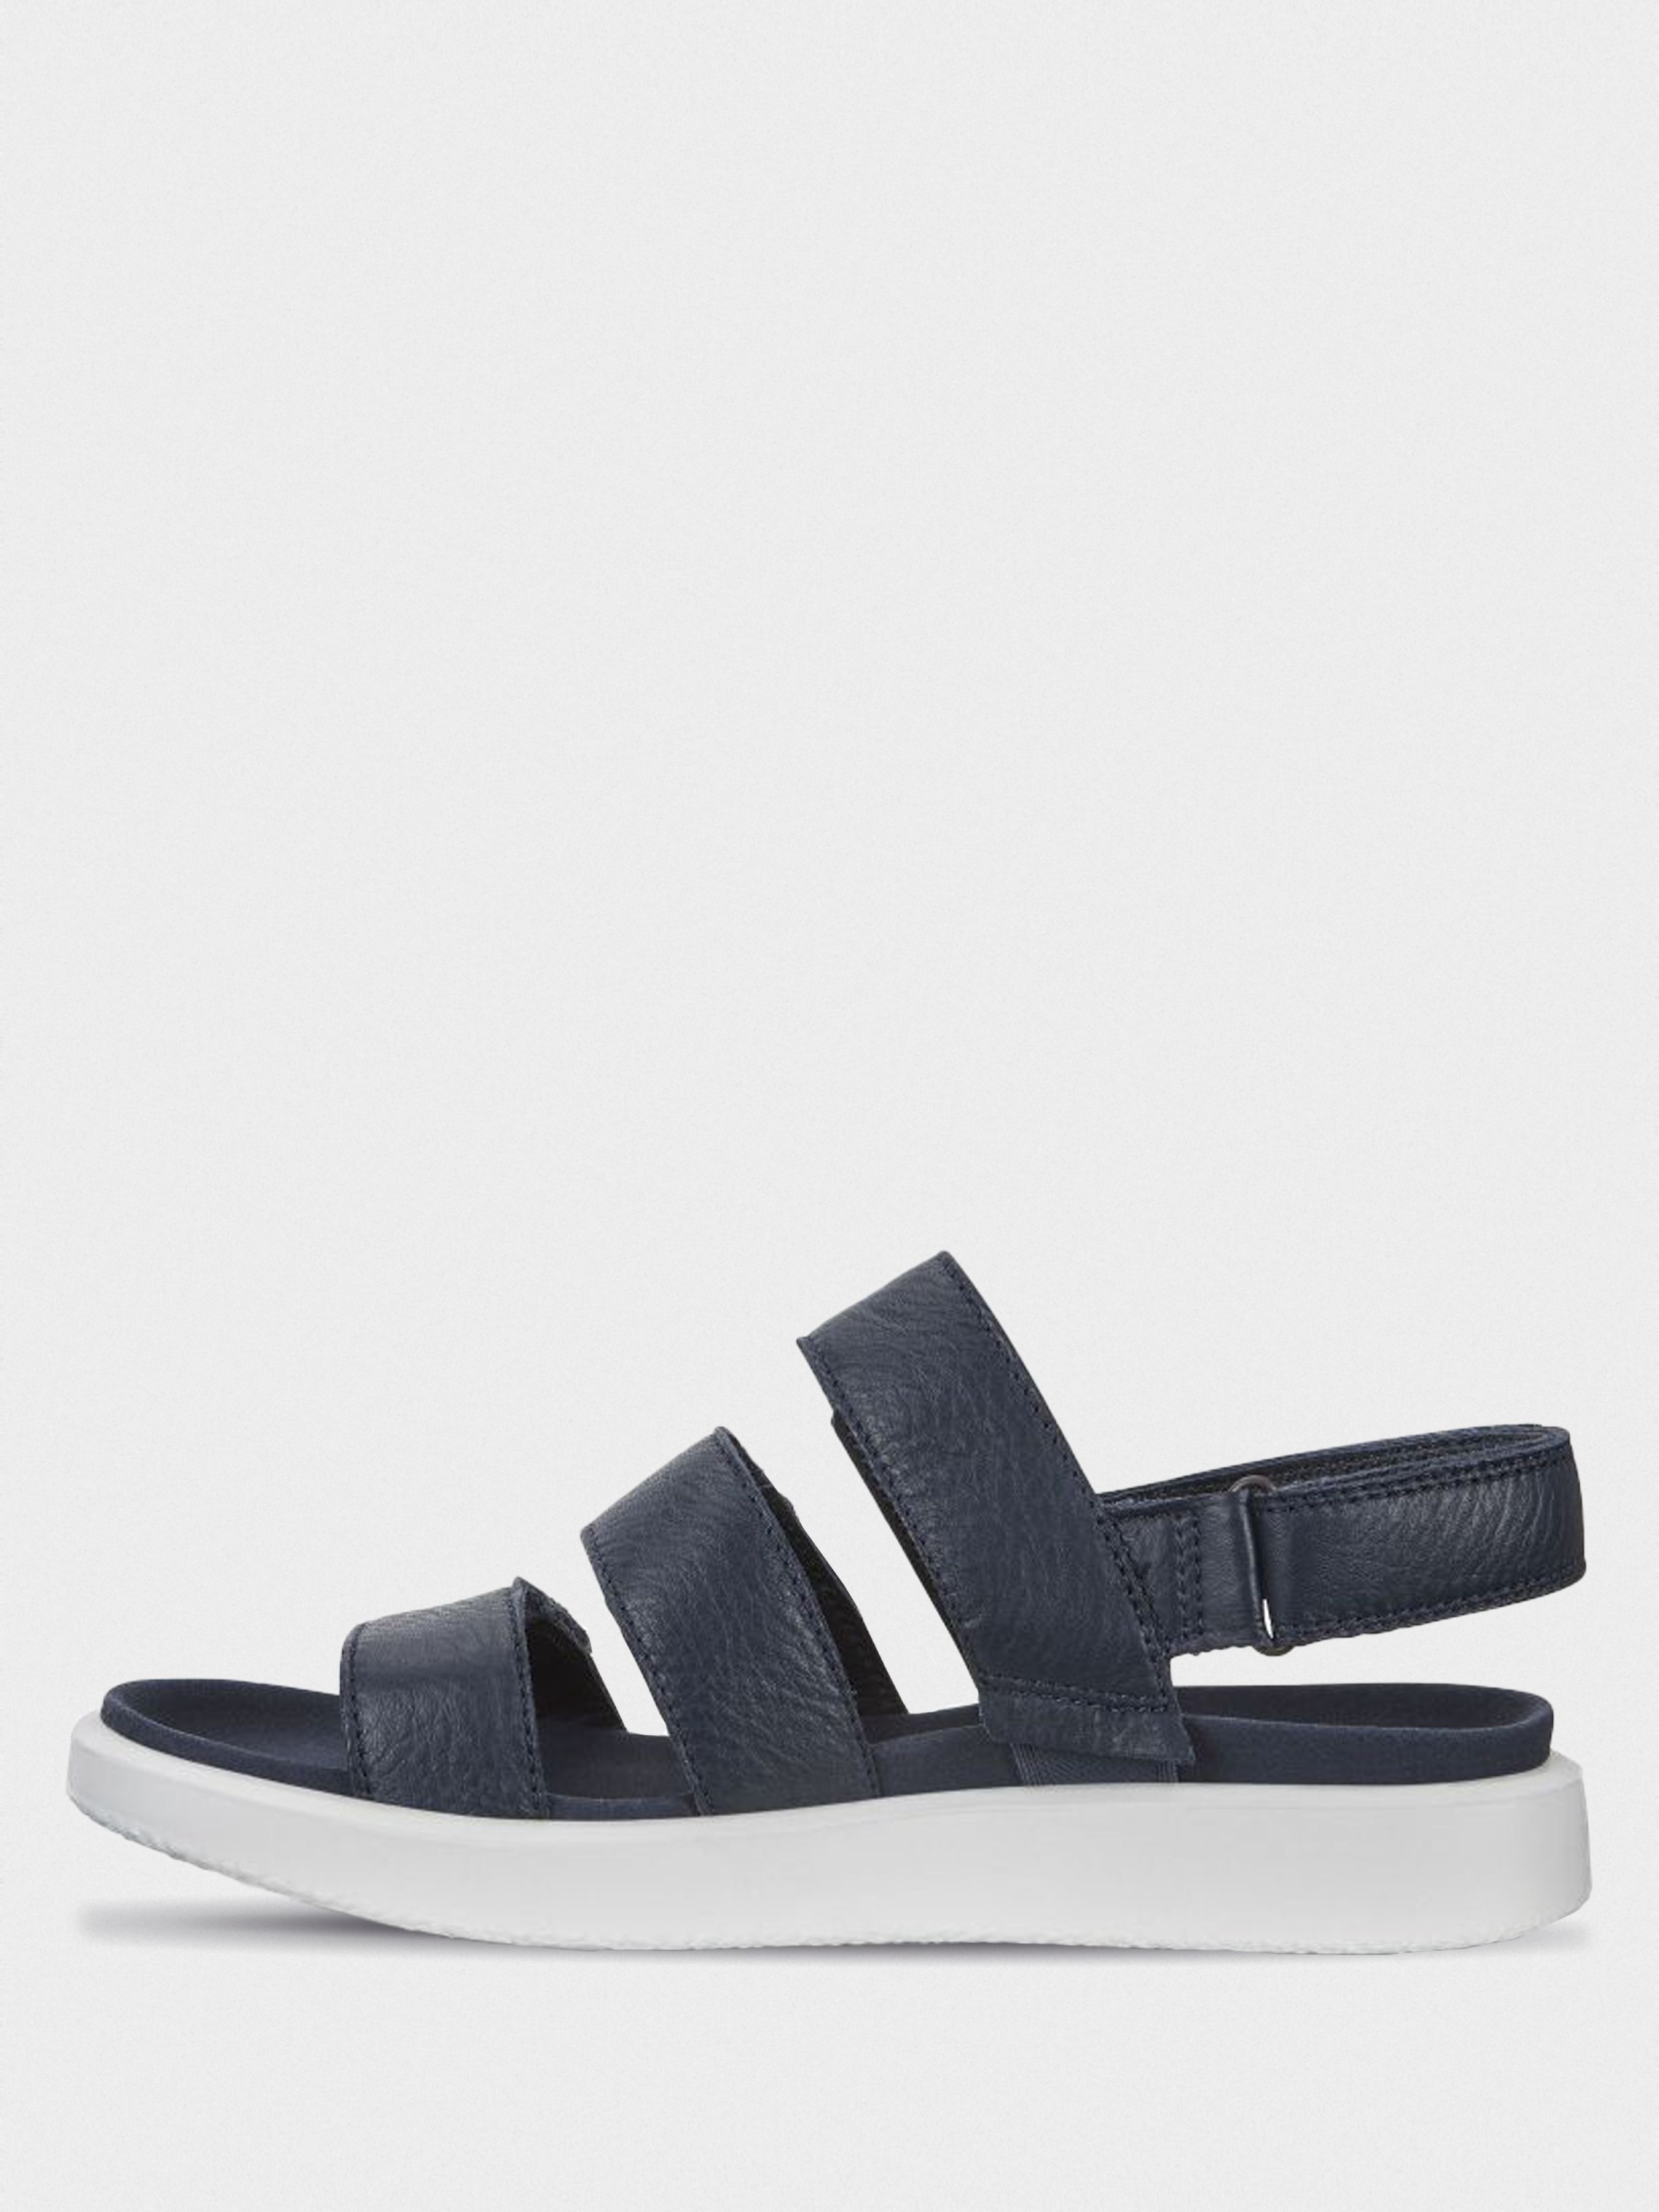 Сандалии для женщин ECCO FLOWT W ZW6175 купить обувь, 2017